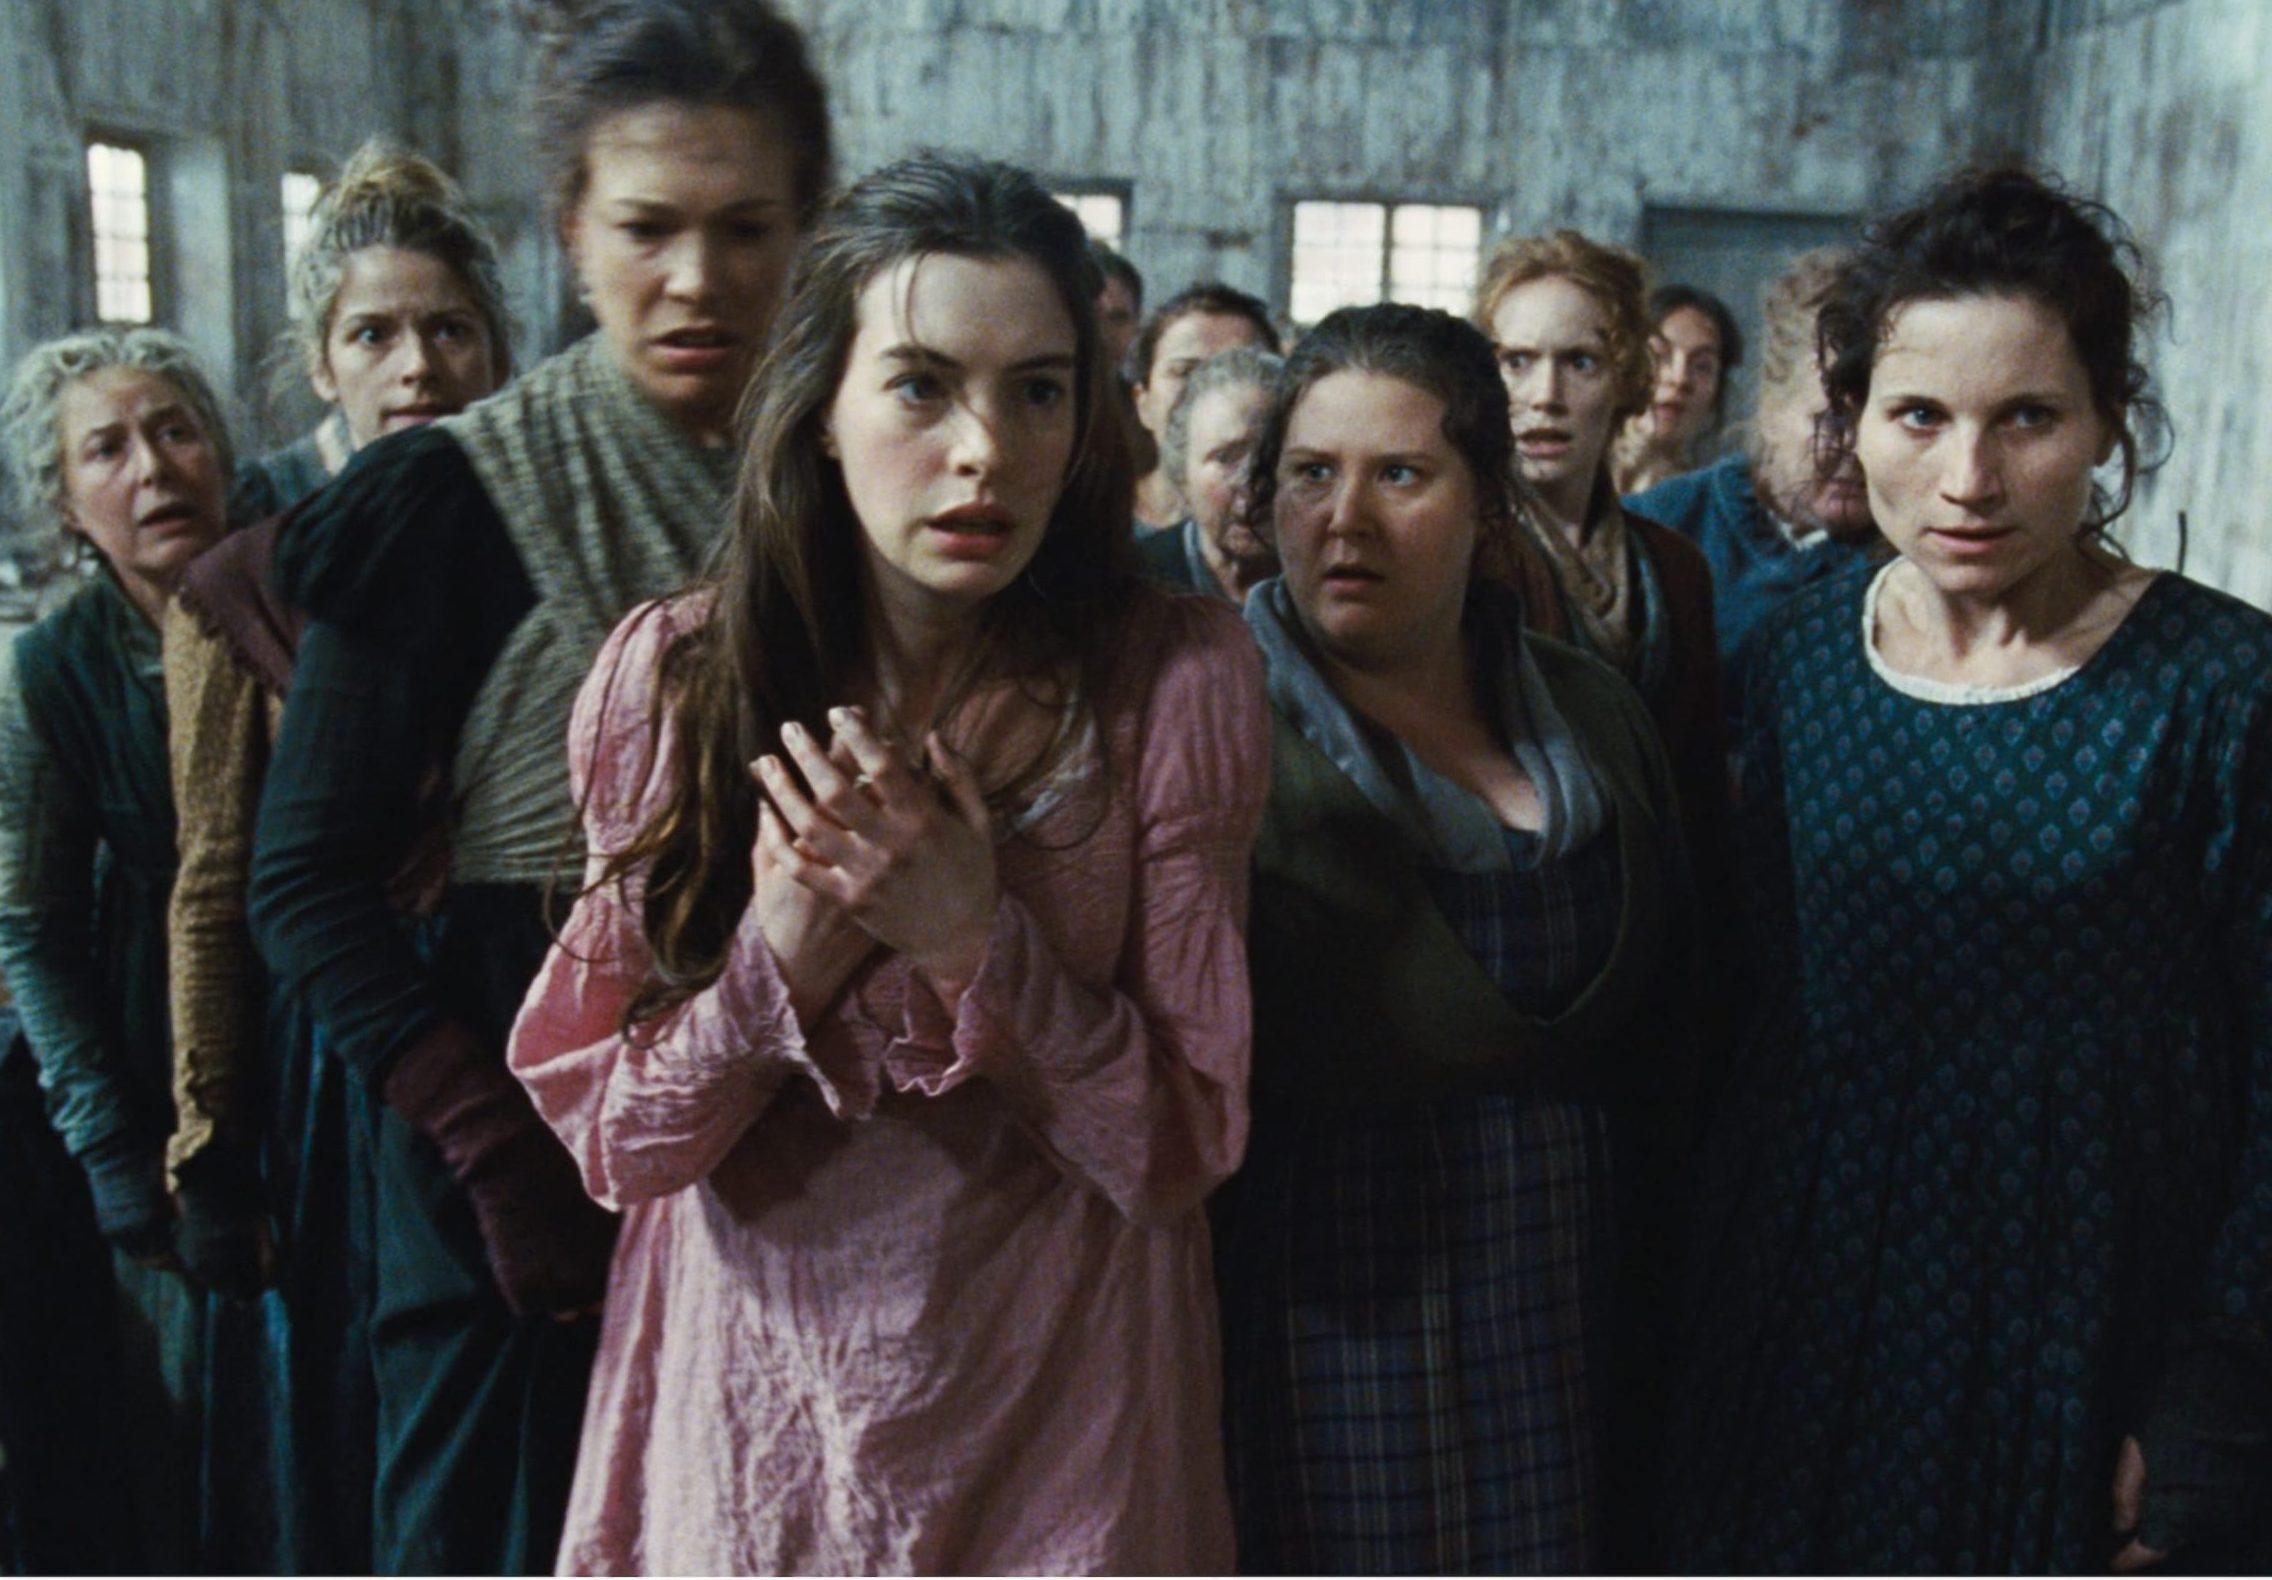 12466156 Les Miserables trans NvBQzQNjv4BqHIoaVzhoax1Rs v ssxb4WNomenpqSITaaEqJCJeuI scaled e1625739145197 25 Things You Didn't Know About Les Misérables (2012)